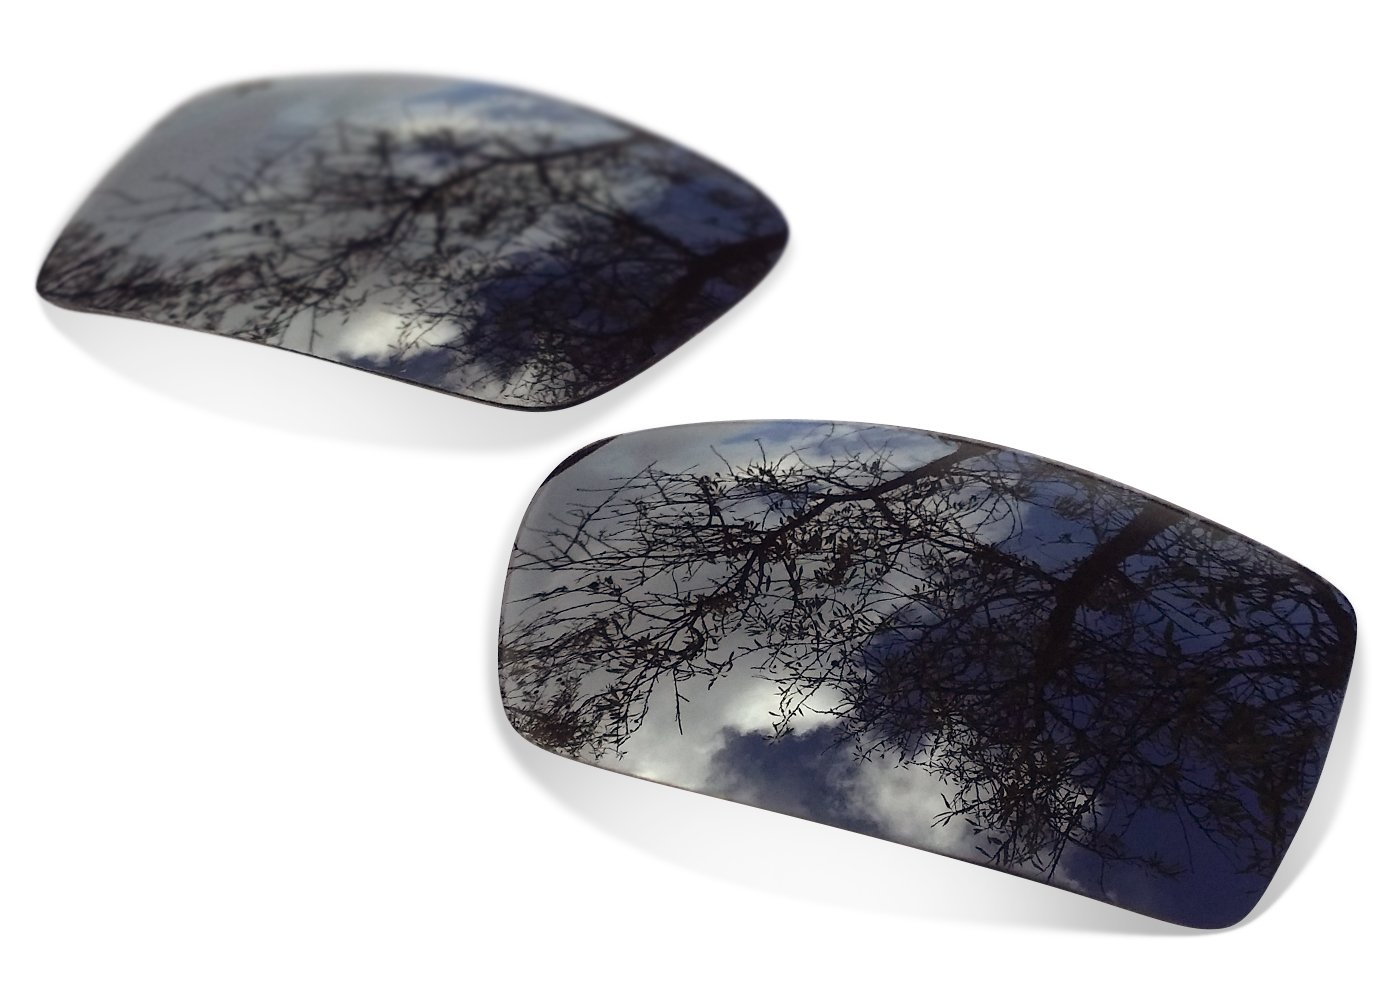 Sunglasses Restorer Lentes Polarizadas Black Iridium para Oakley Gascan